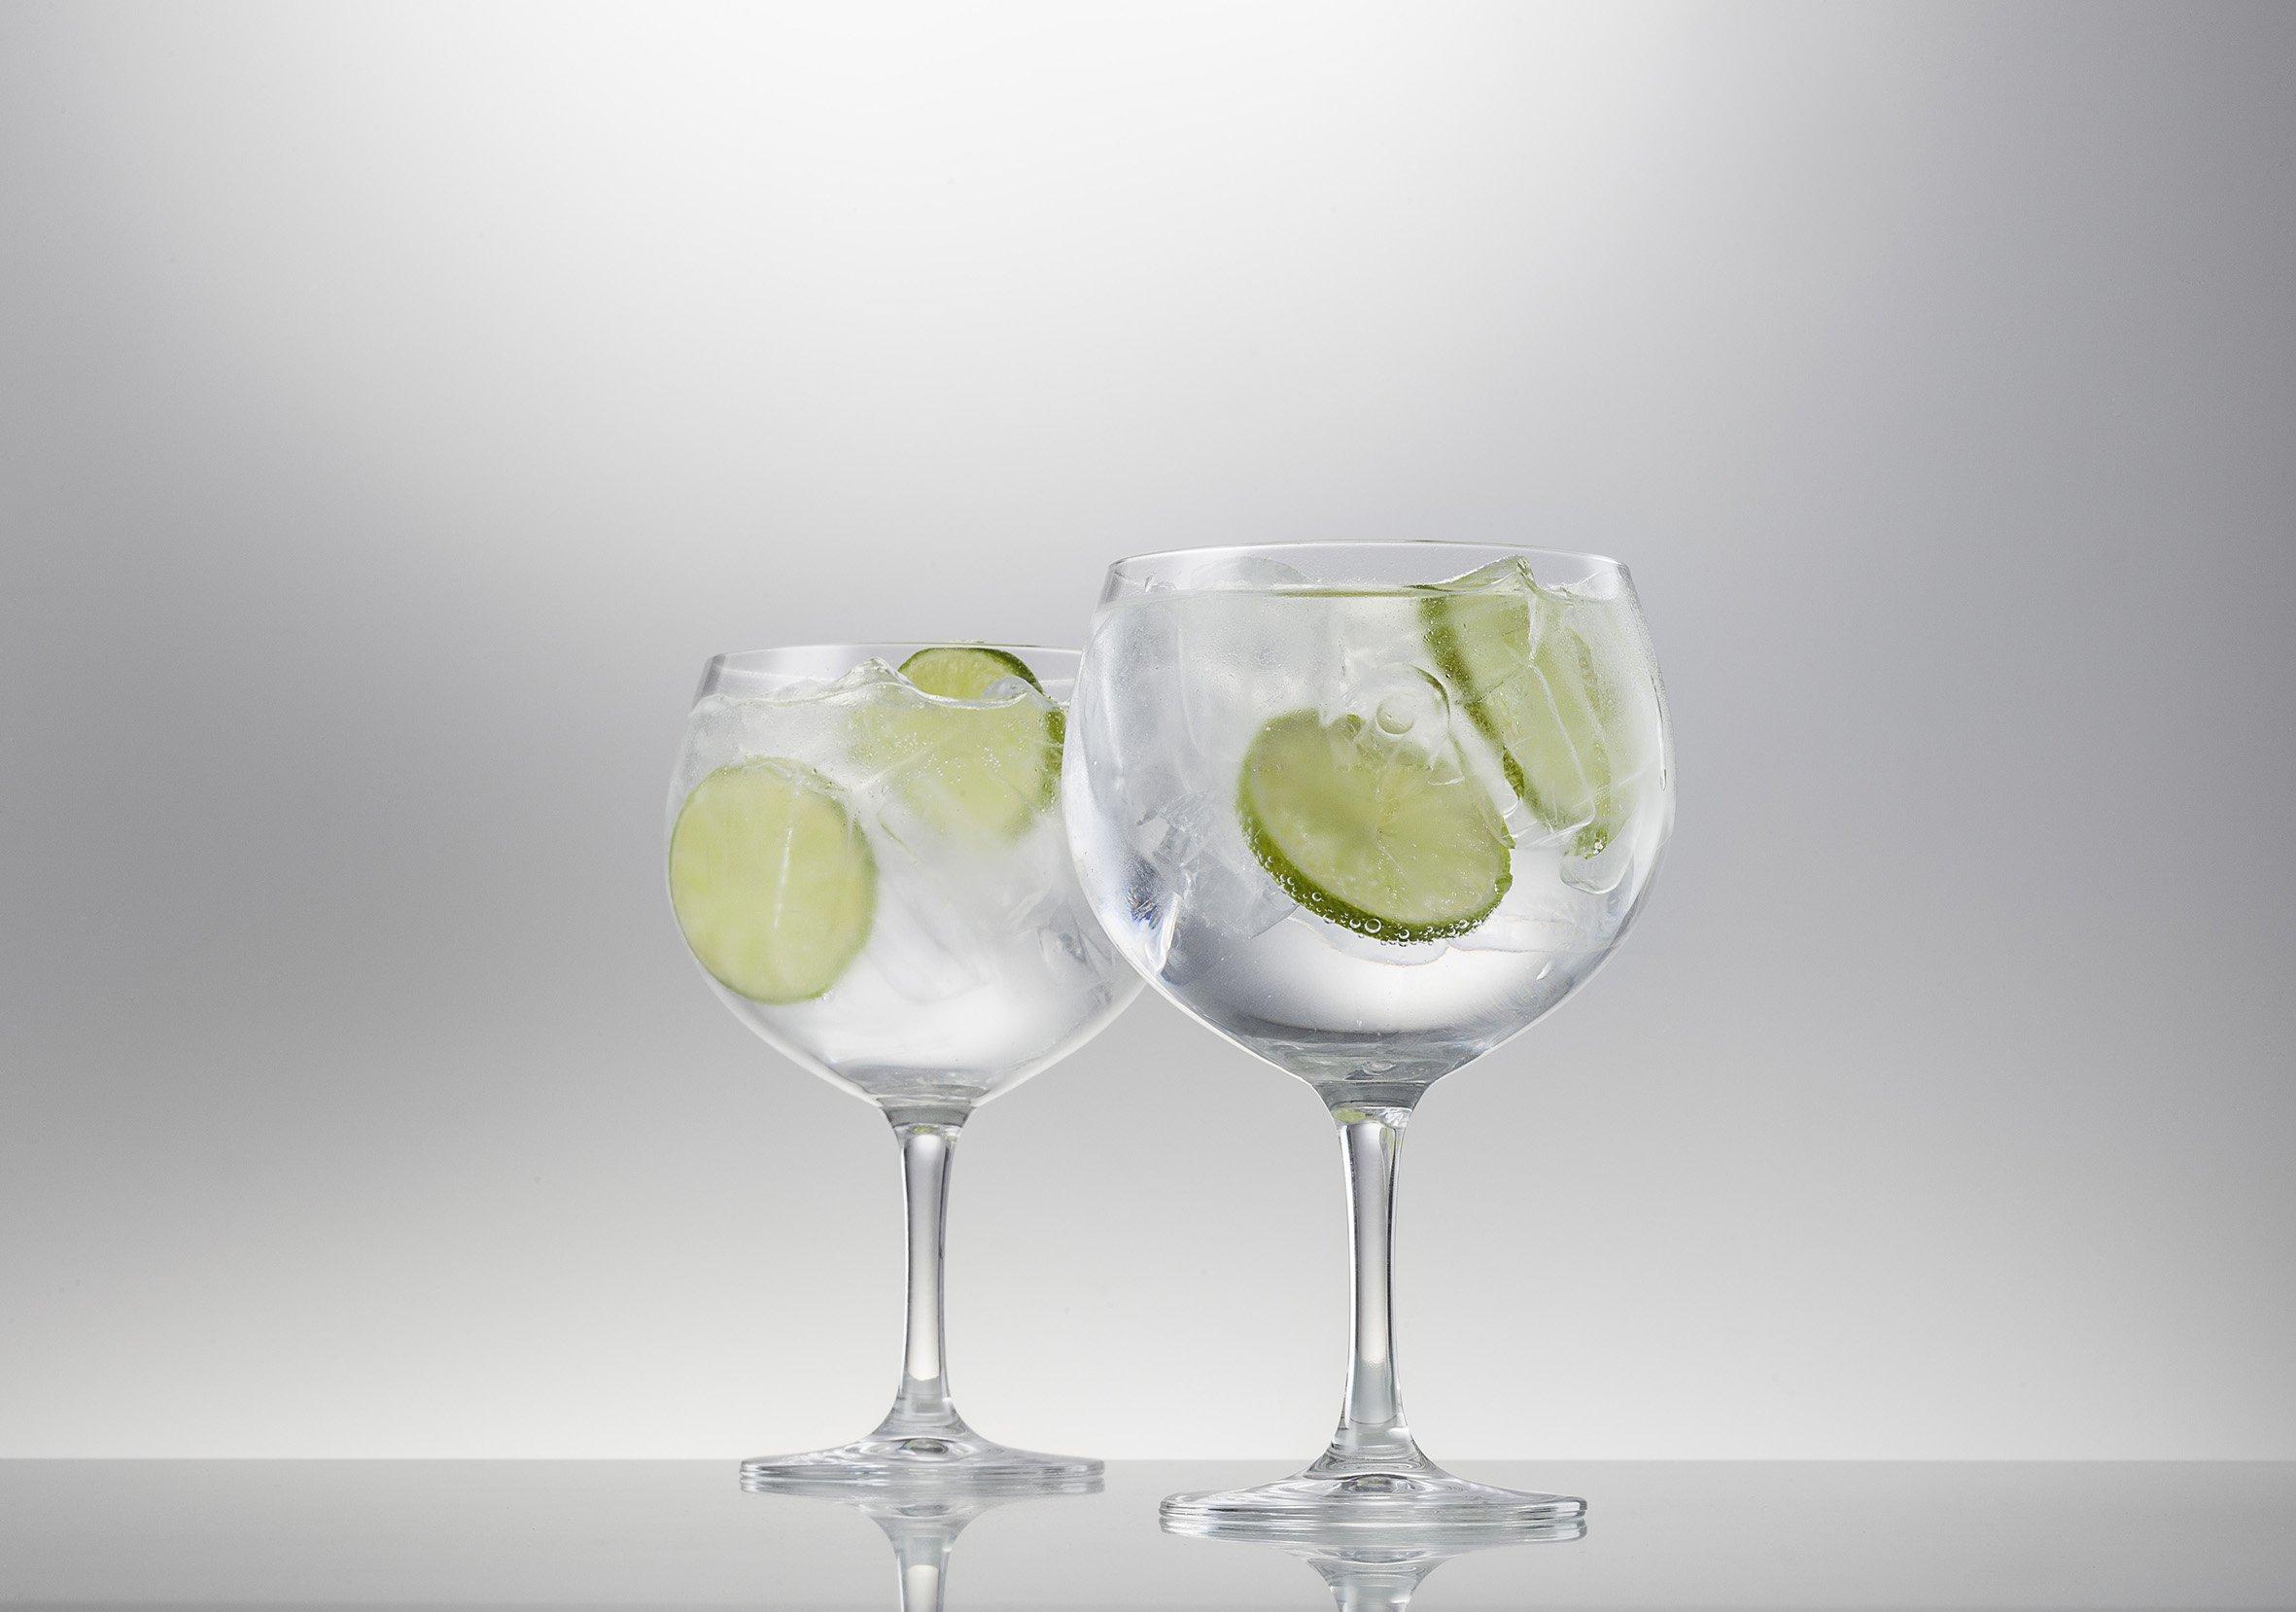 Schott Zwiesel Tritan Crystal Glass Barware Bar Special Sangria Margarita Glasses (Set of 6), 23.5 oz, Clear